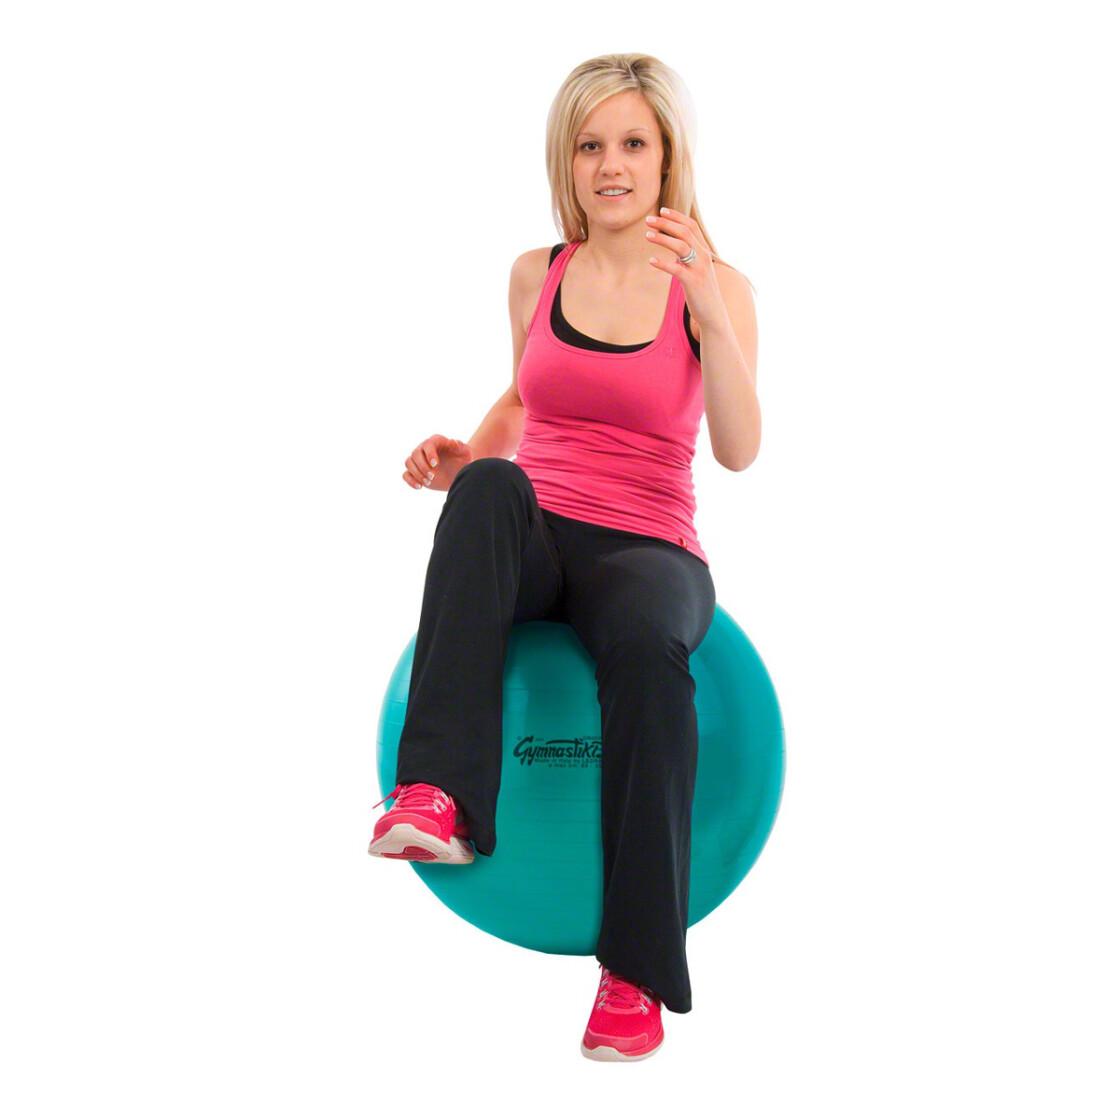 original pezzi gymnastikball sitzball 65 cm gr n outdoor ausr s. Black Bedroom Furniture Sets. Home Design Ideas